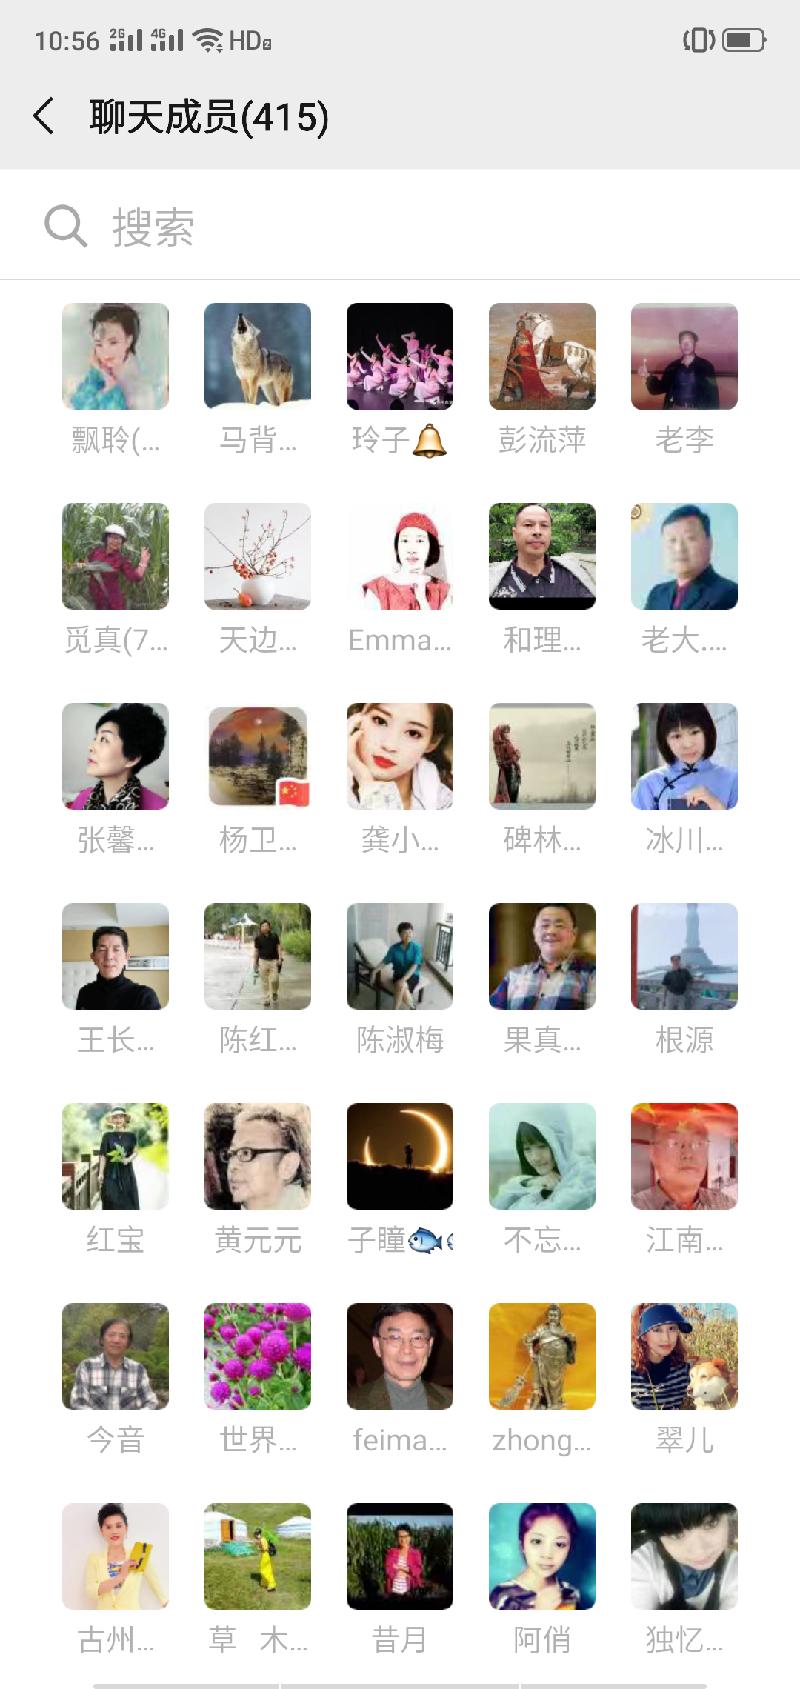 Screenshot_2020-01-15-10-56-47-65